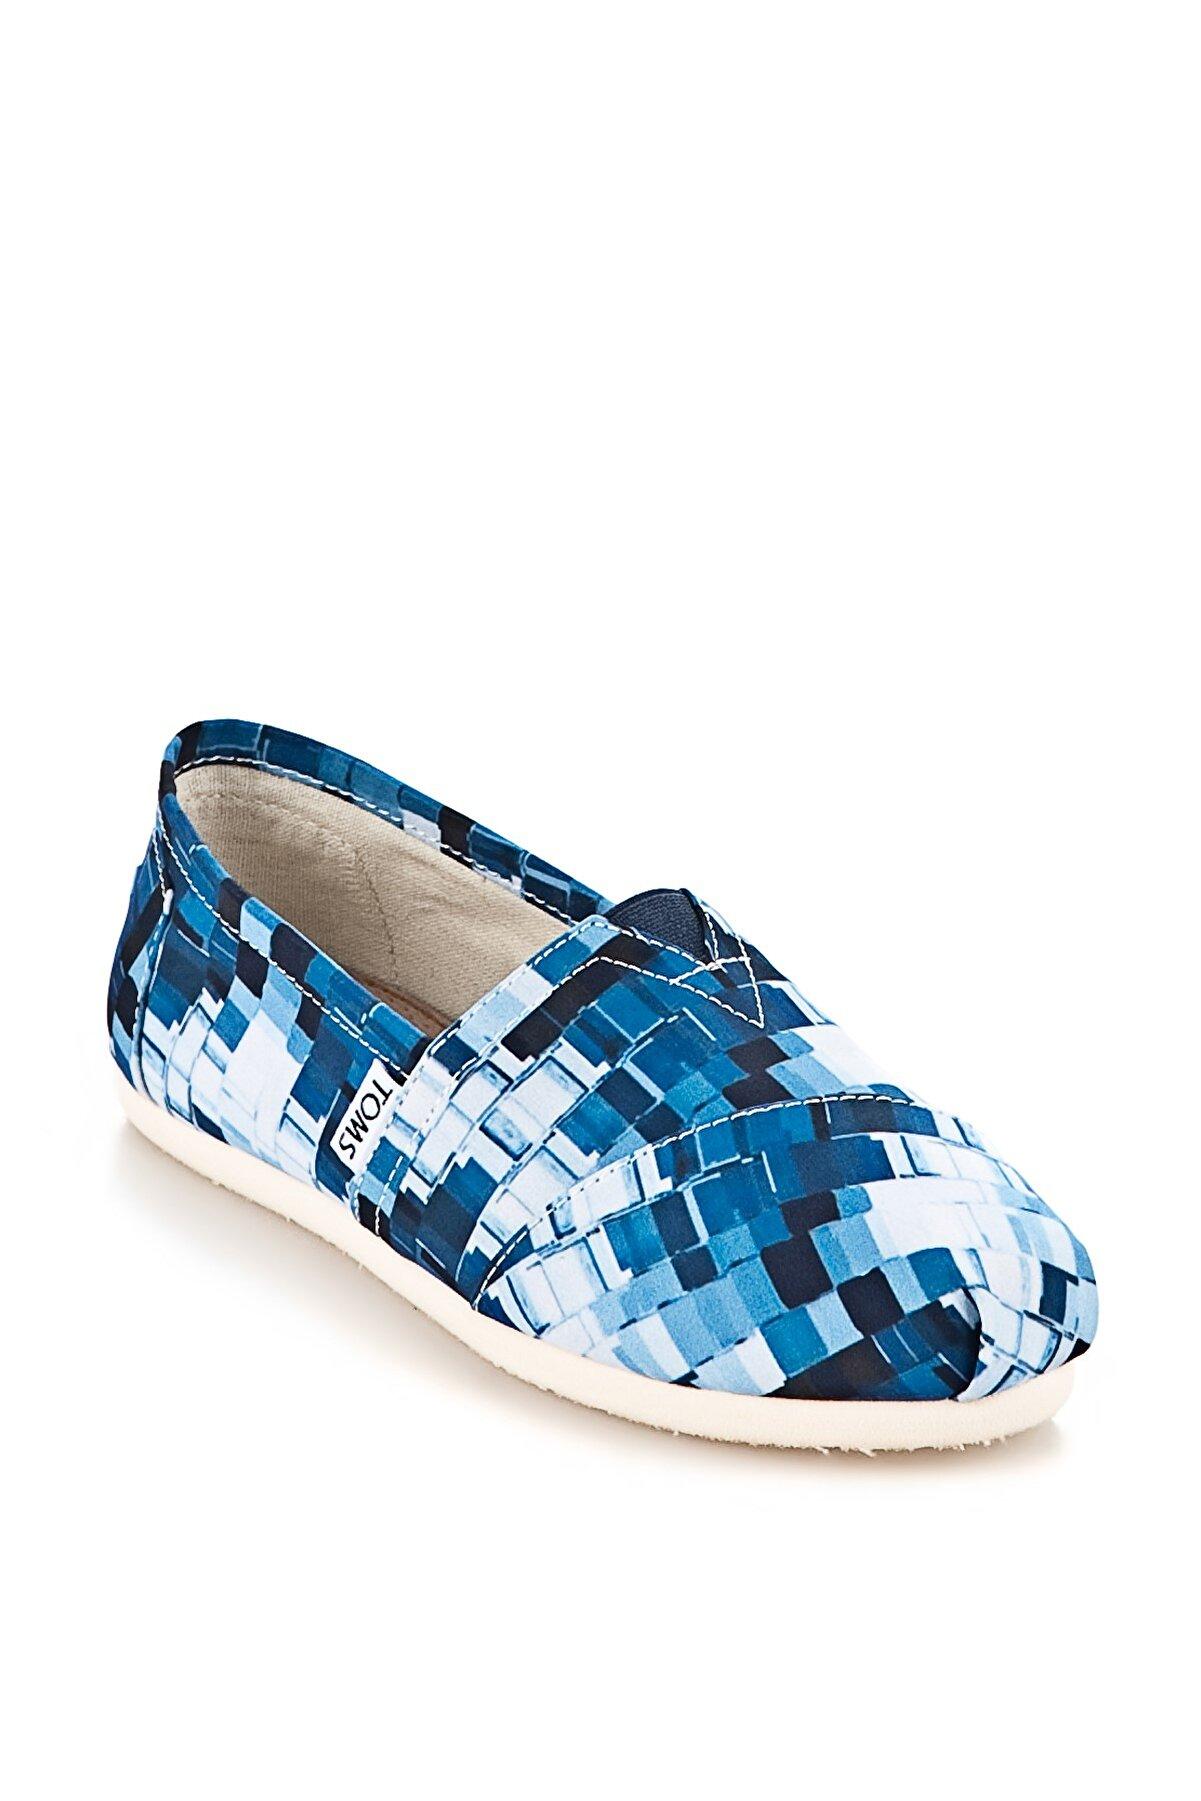 Toms Kadın Toms Ayakkabı 10004949